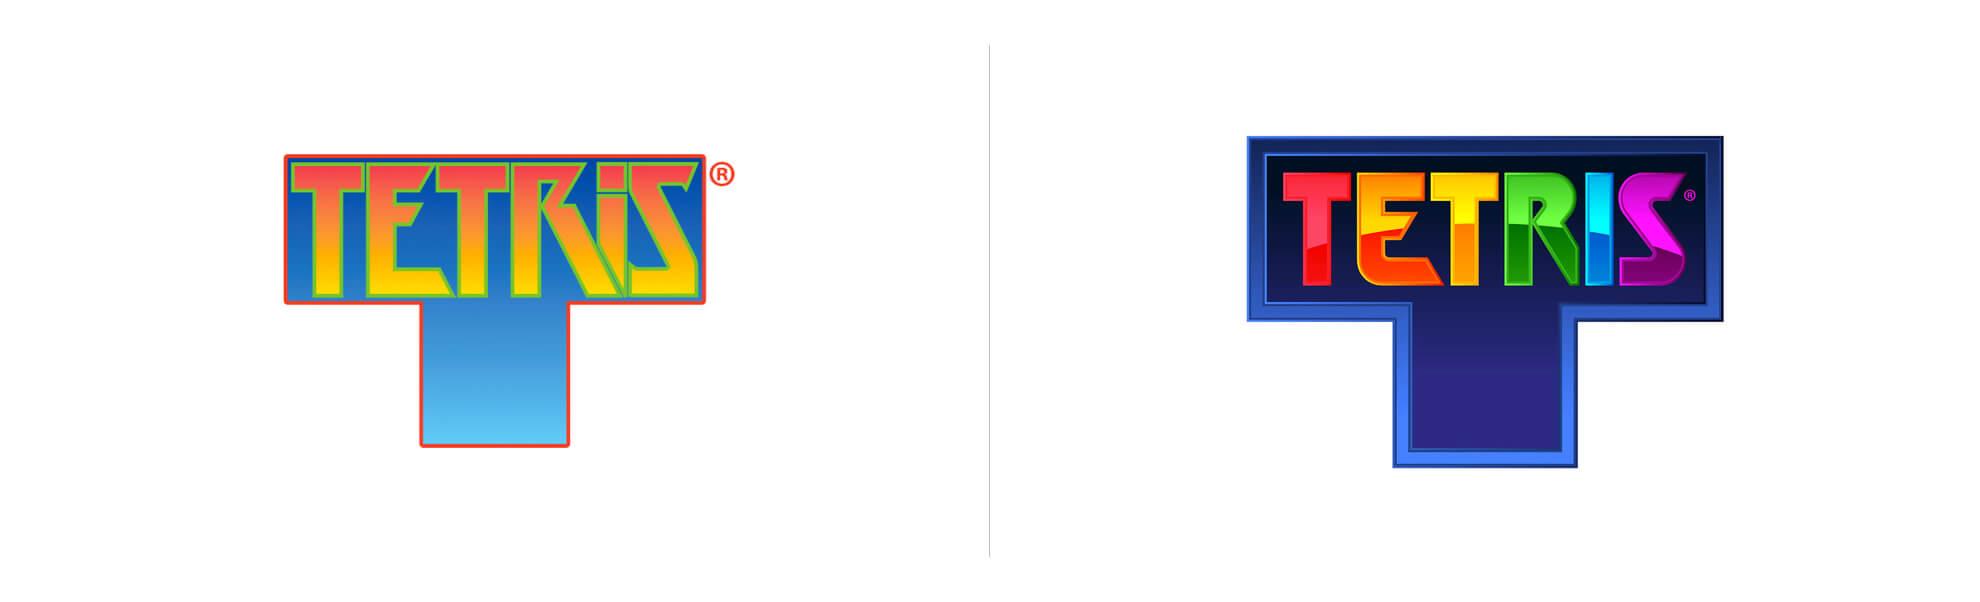 Tetris zmienia logo